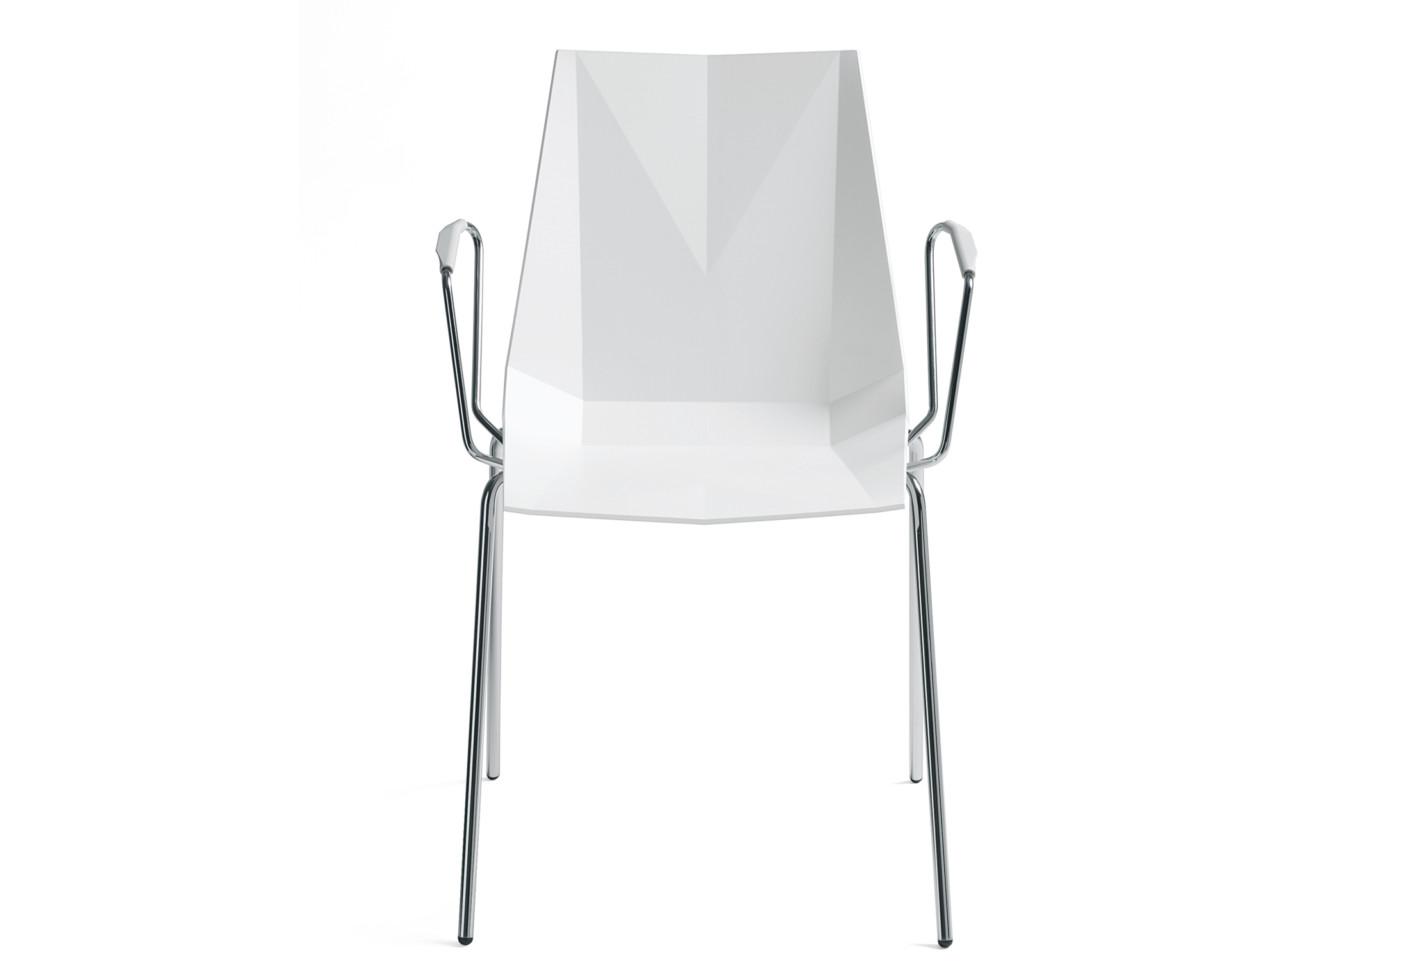 Mayflower plastikstuhl mit armlehne von materia stylepark for Design plastikstuhl